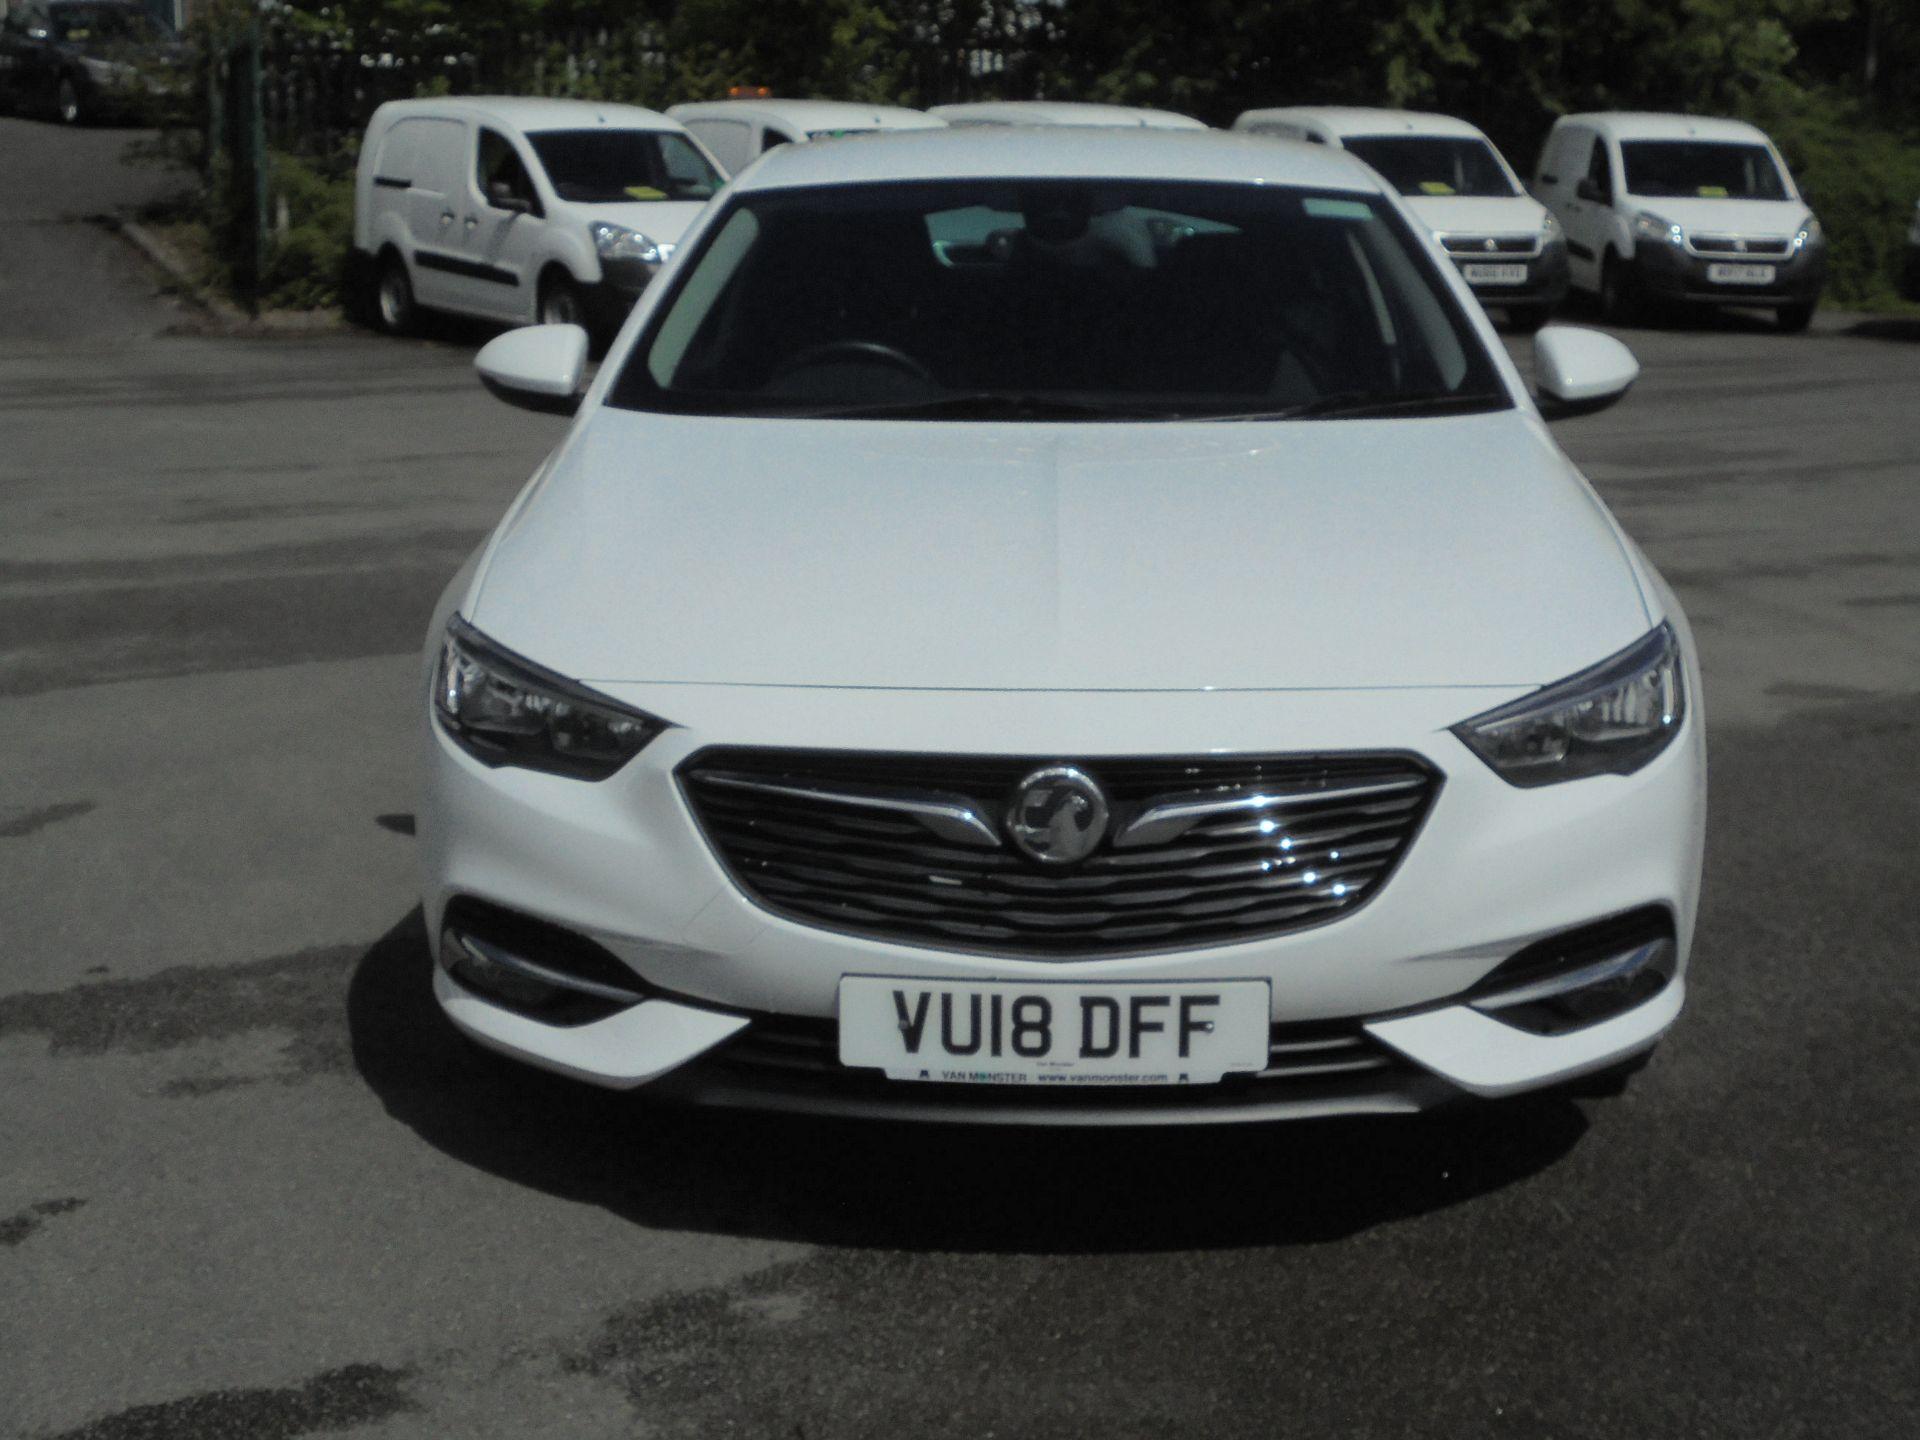 2018 Vauxhall Insignia Grand Sport 1.6 Turbo D Ecotec [136] Sri Nav 5Dr (VU18DFF) Image 2